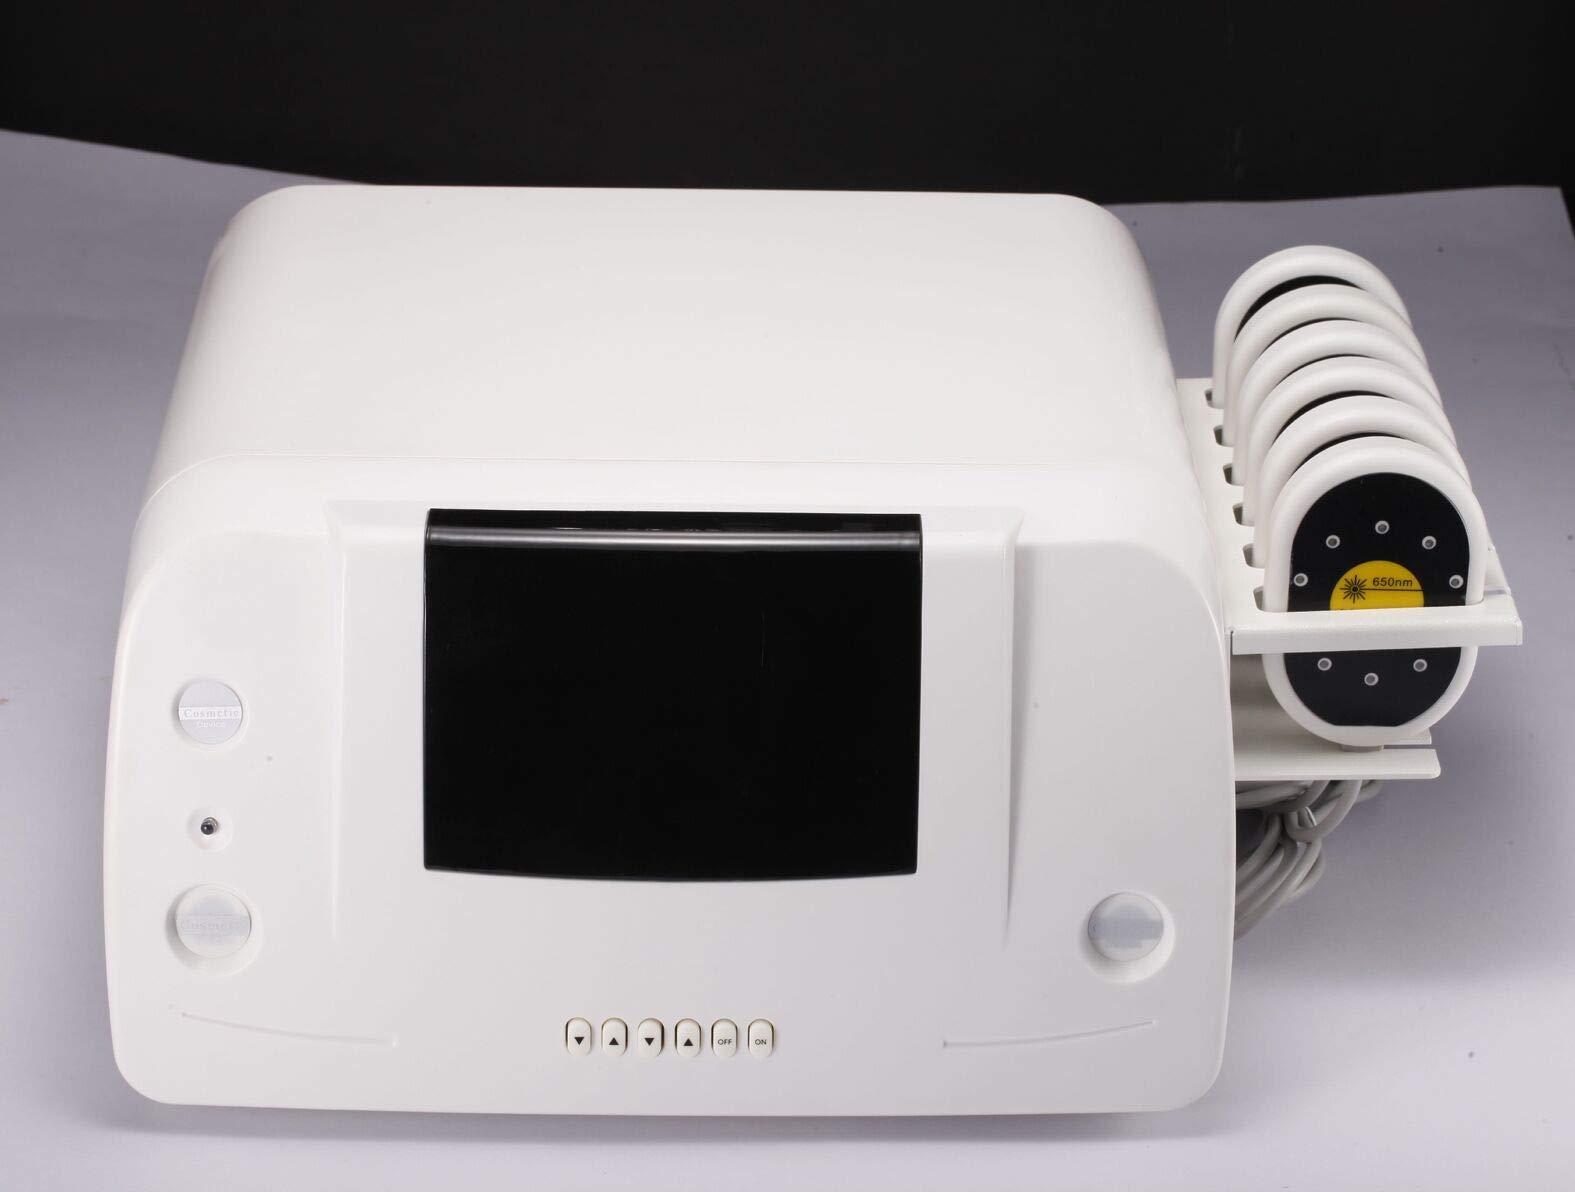 DIA BEAUTY Professional Beauty Salon Equipment Fat Reduce Device L-I-P-O L-A-S-E-R System by DIA BEAUTY (Image #3)